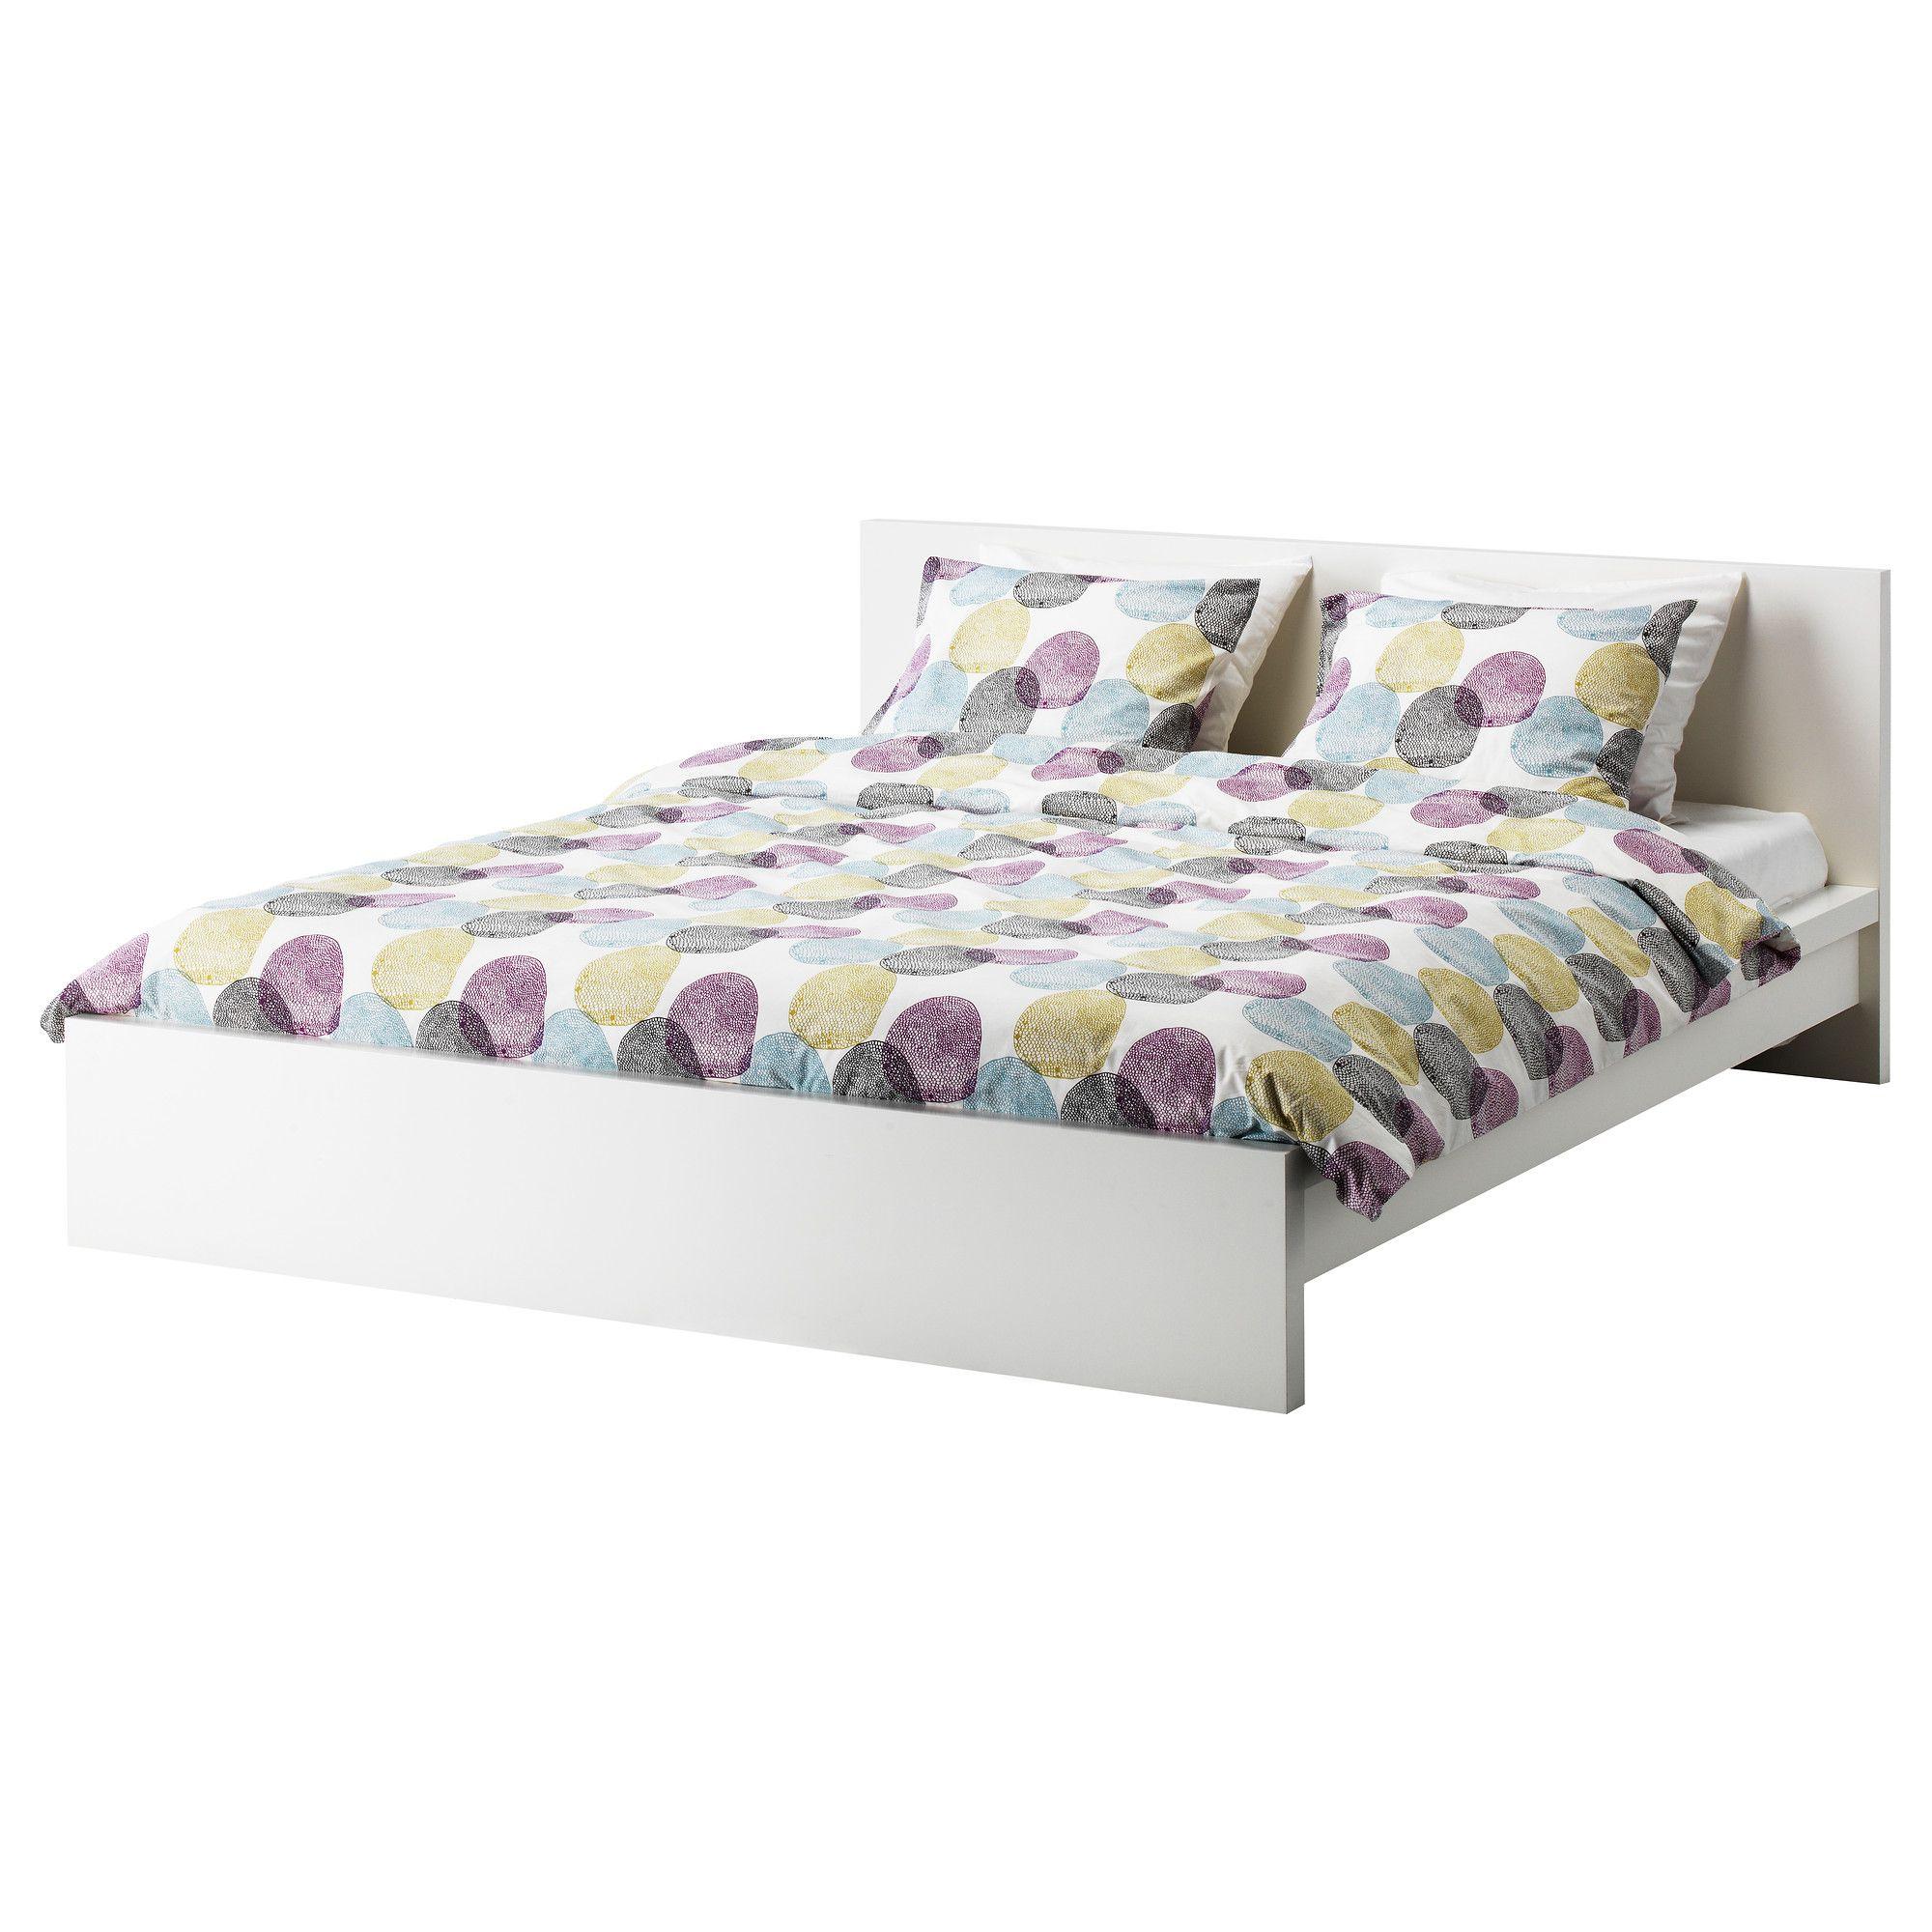 Us Furniture And Home Furnishings Structure De Lit Cadre De